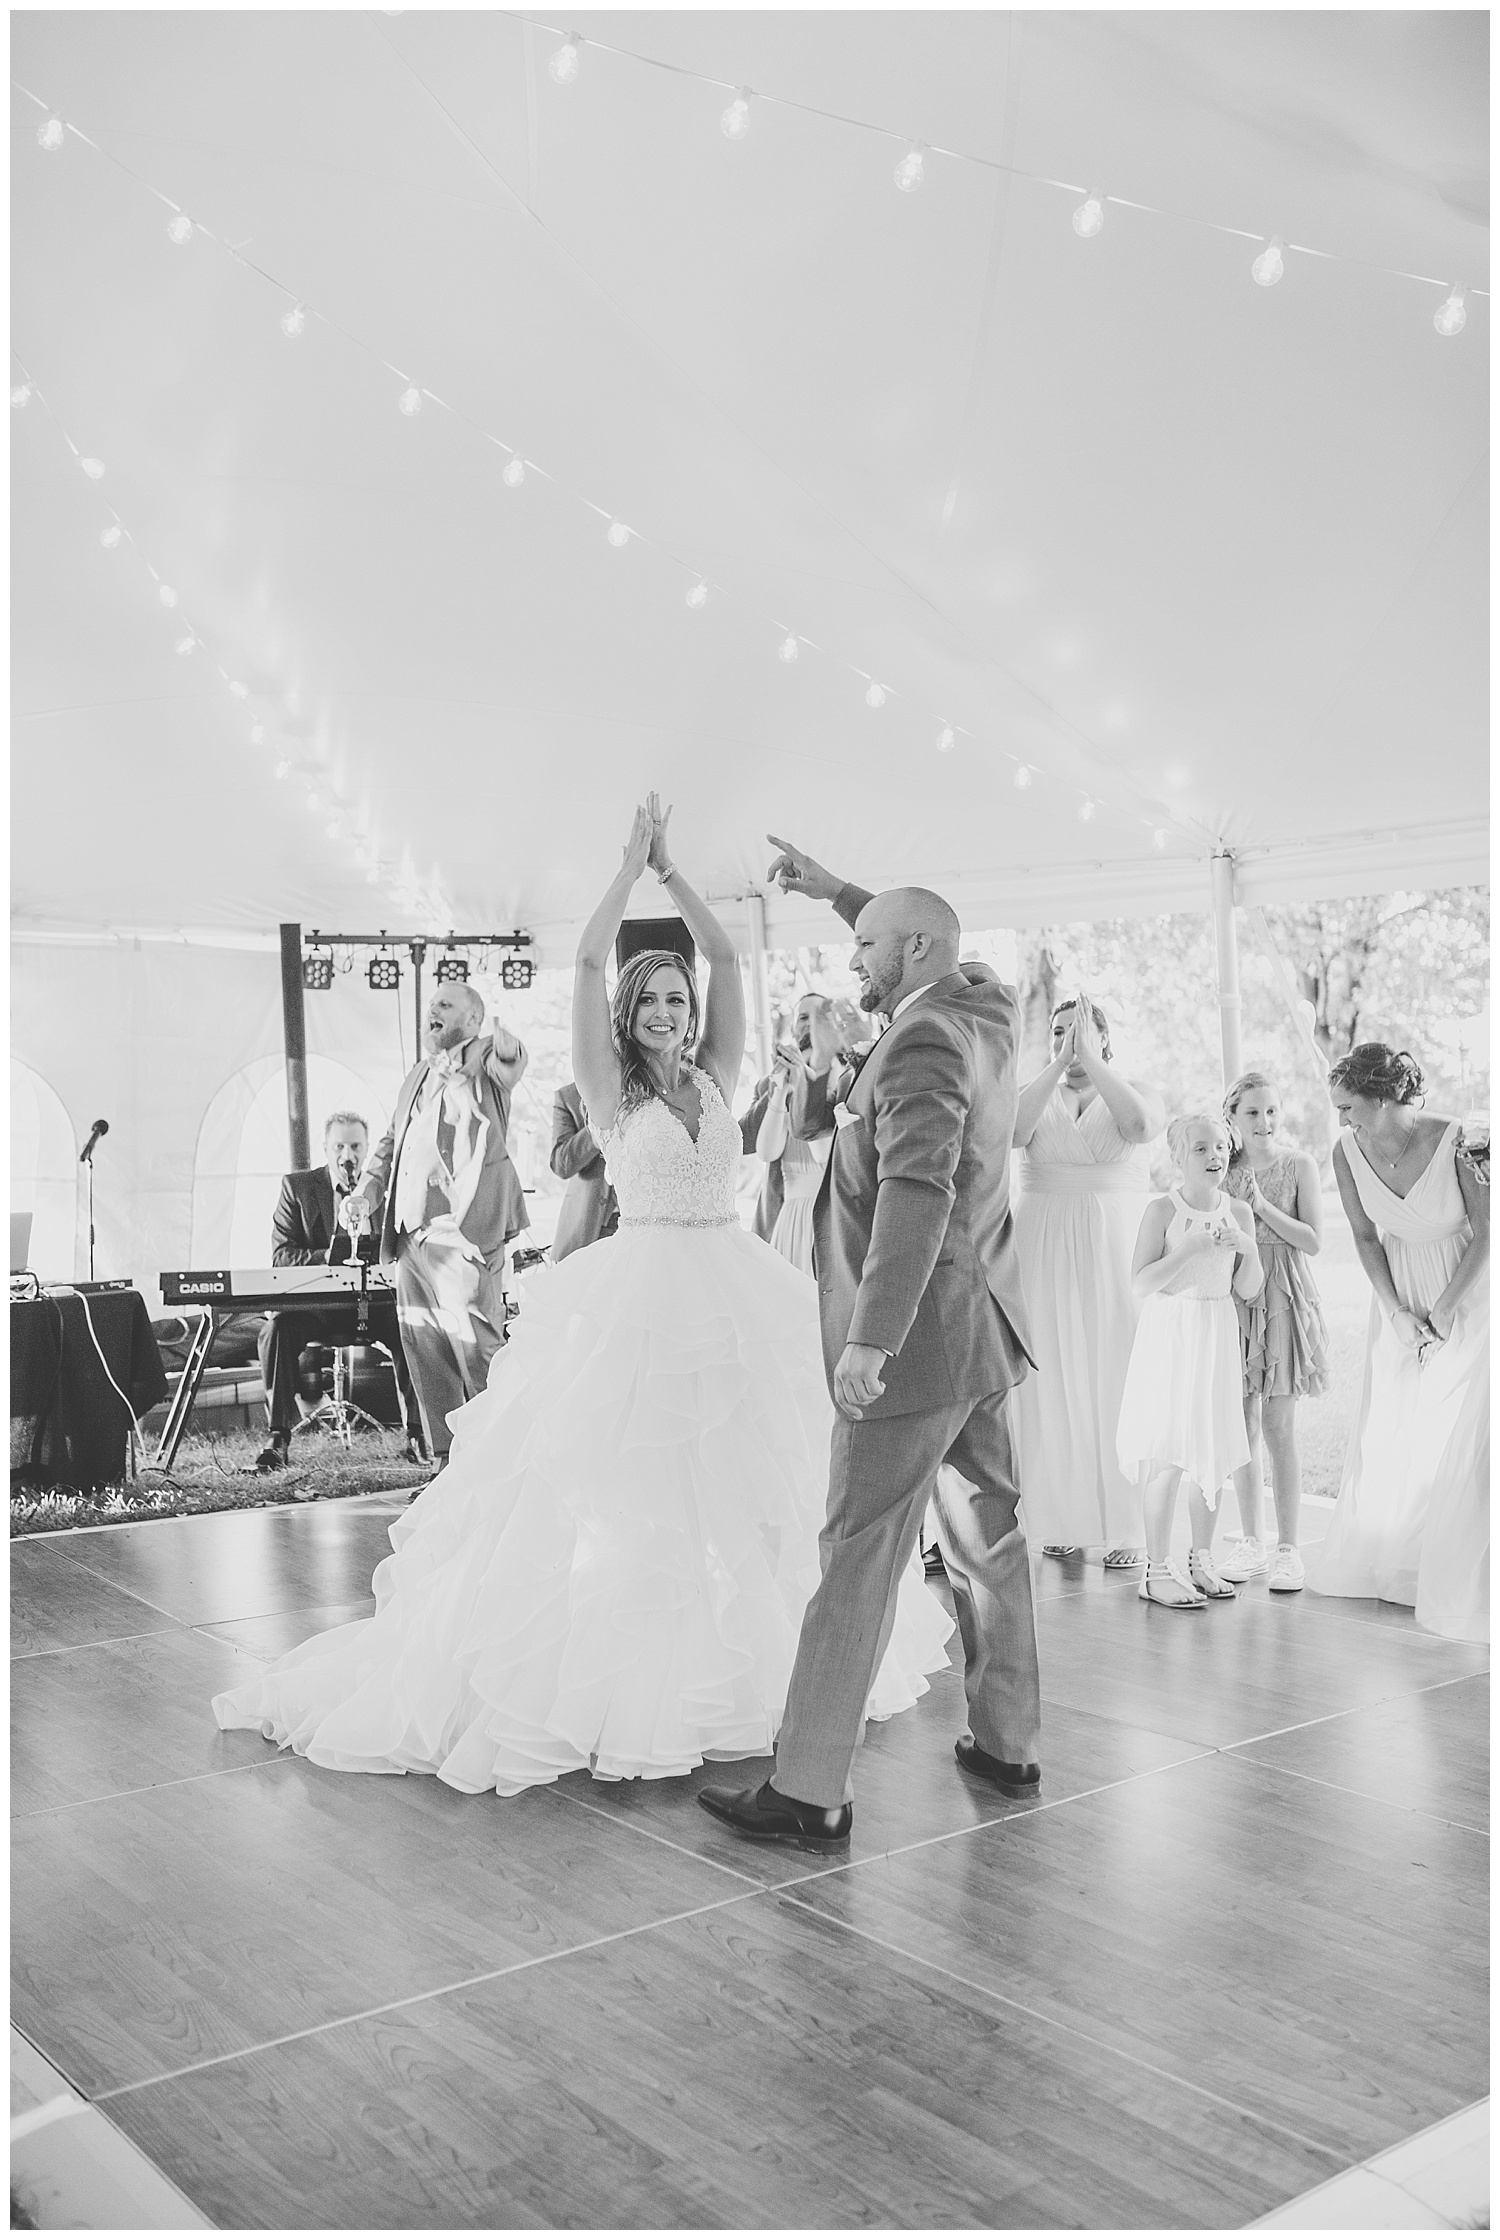 Sean and Andrea - Webster wedding - lass and beau-1334_Buffalo wedding photography.jpg